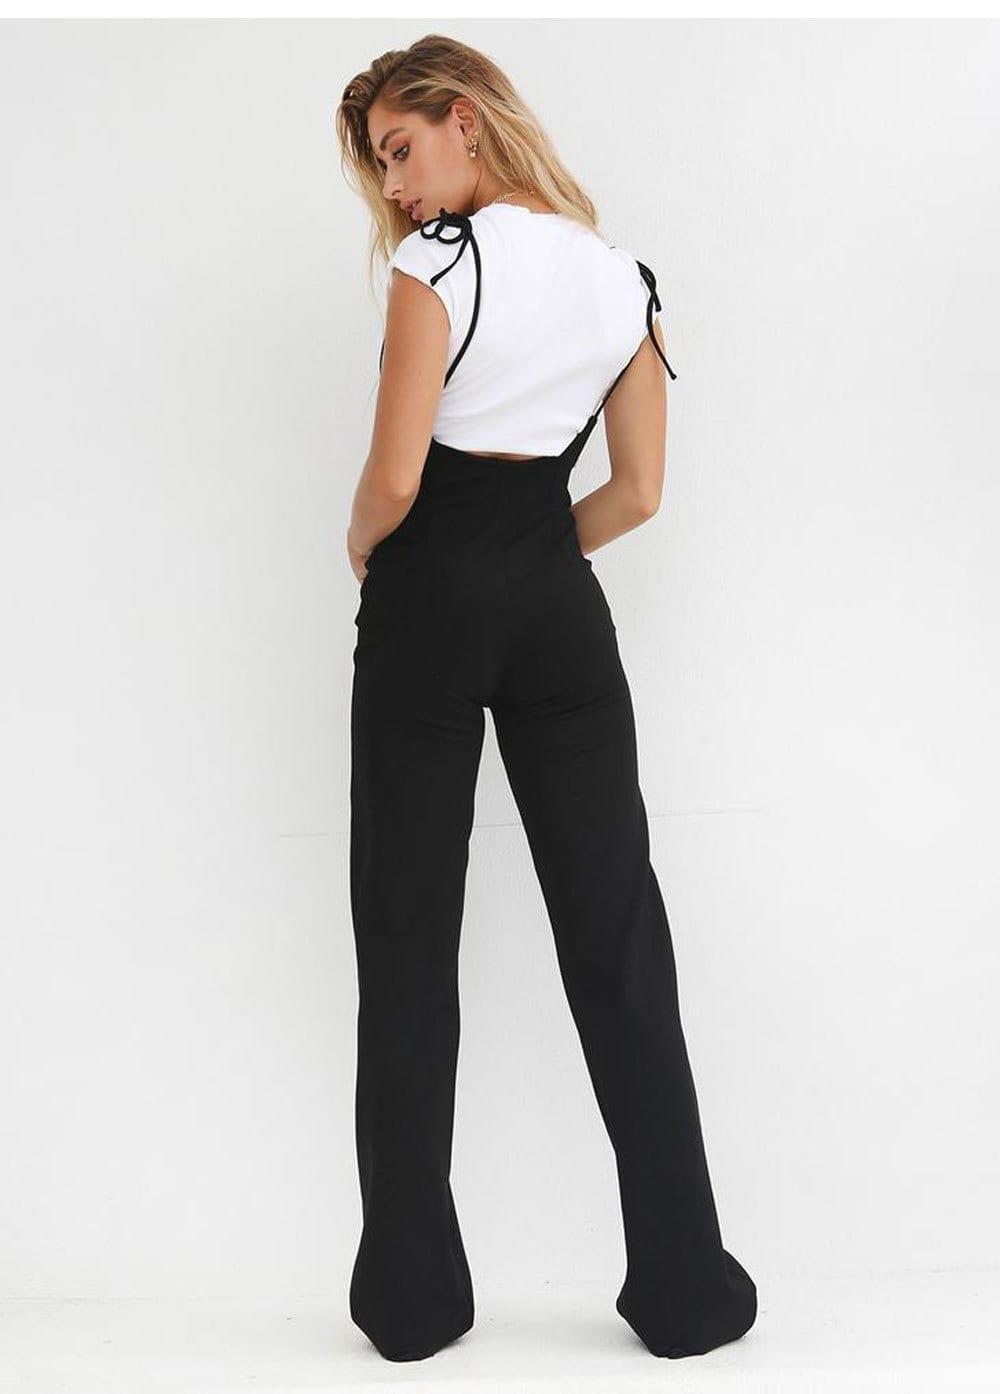 Soft Wide Leg Full-length High Black Lace-up Loose Trouser Pants